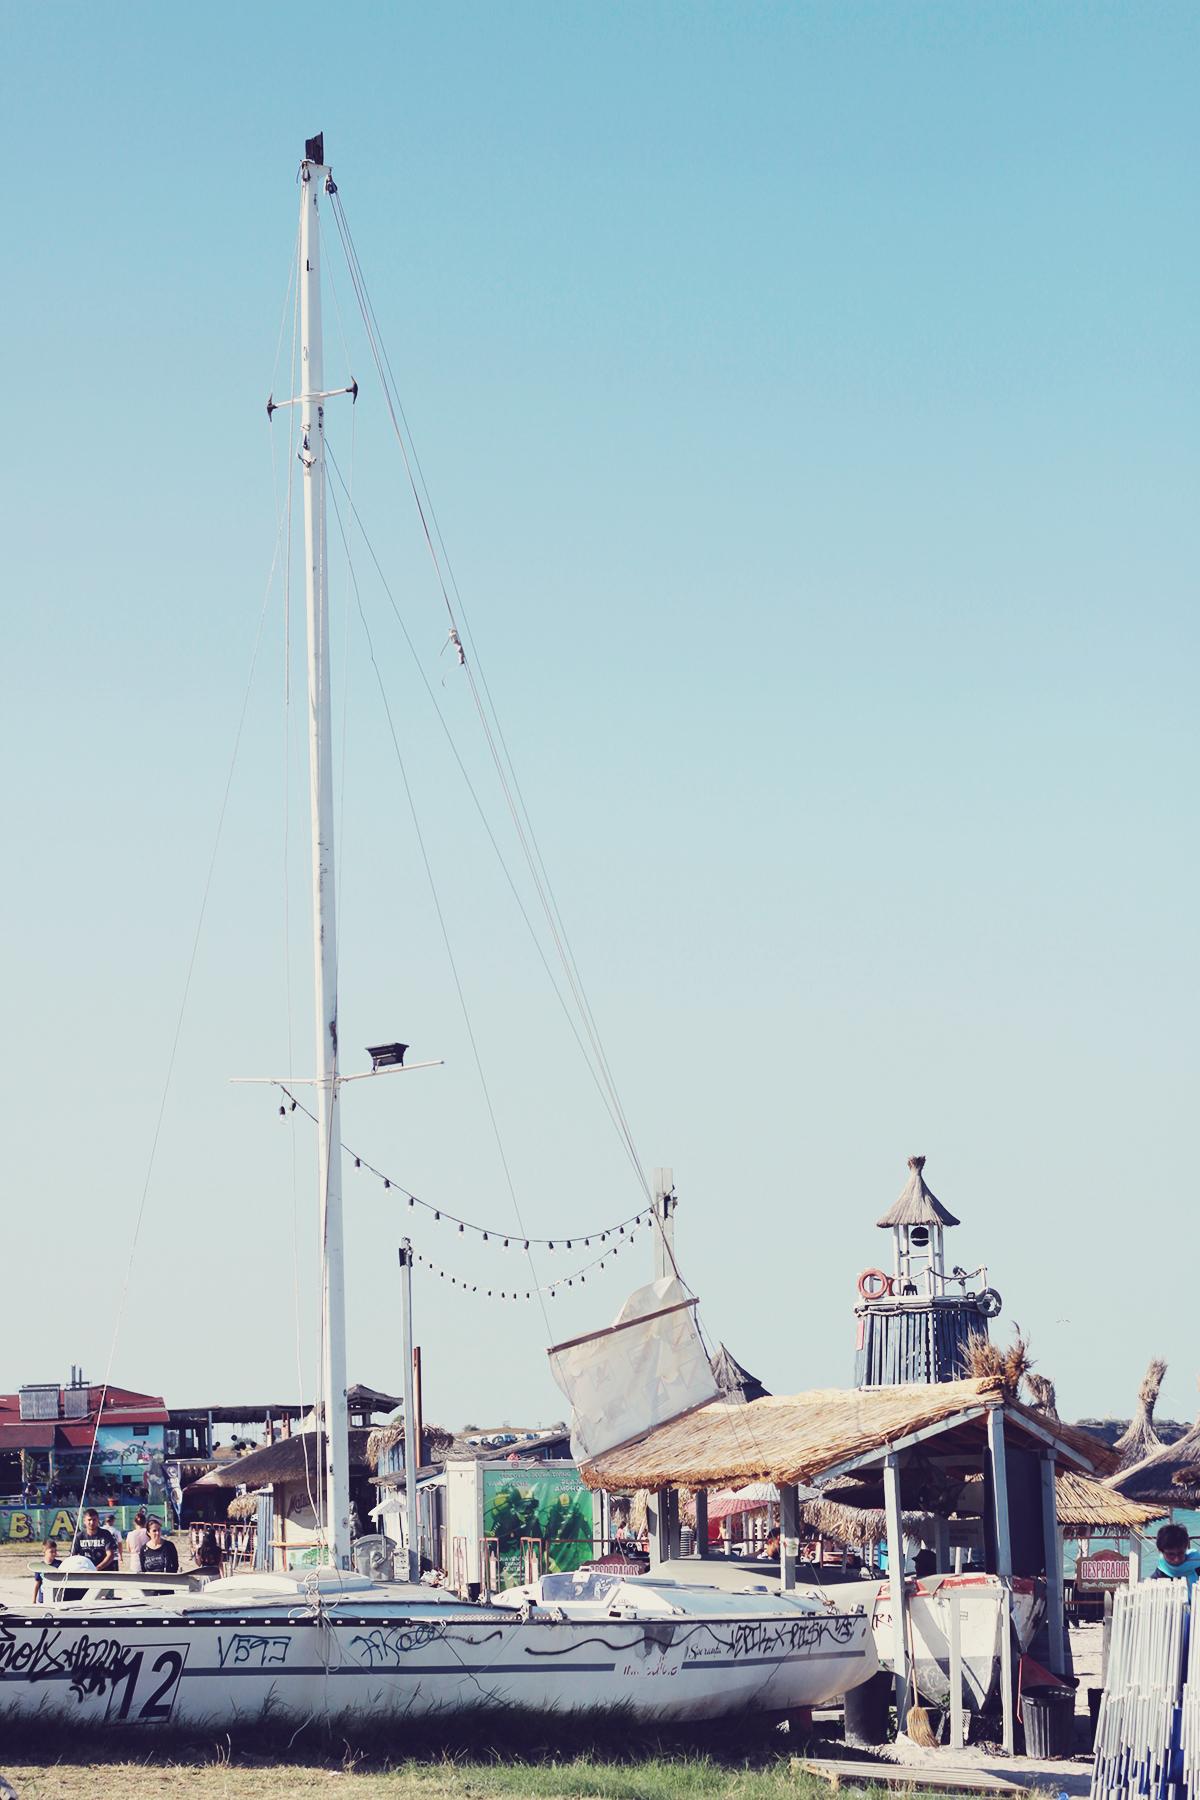 boat, old, beach, vama veche